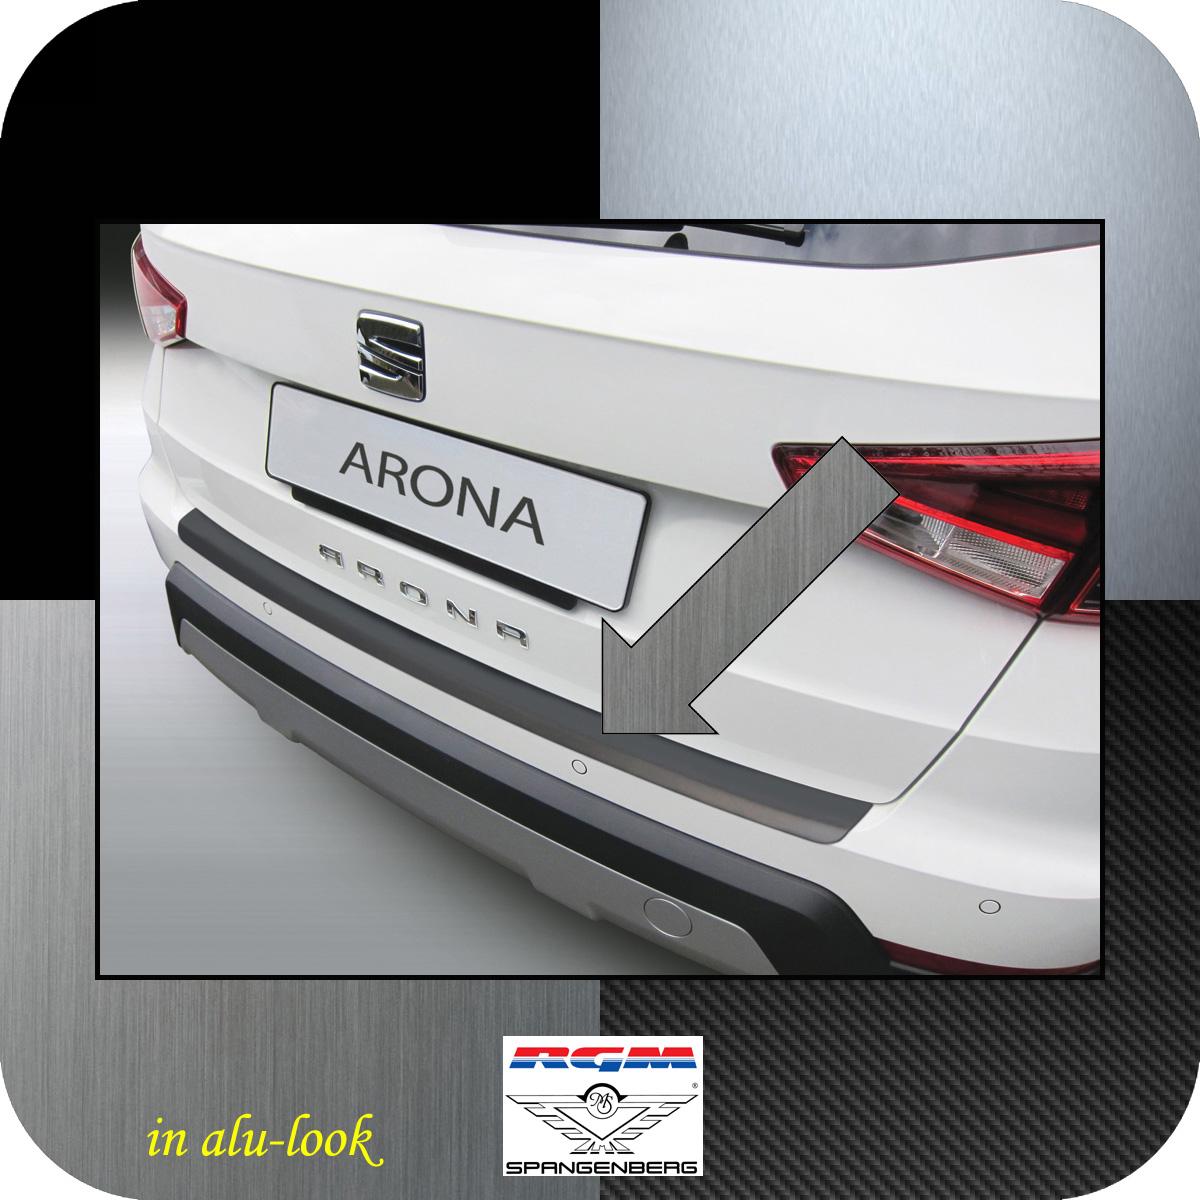 Ladekantenschutz Alu-Look Seat Arona SUV Crossover ab Baujahr 11.2017- 3504624